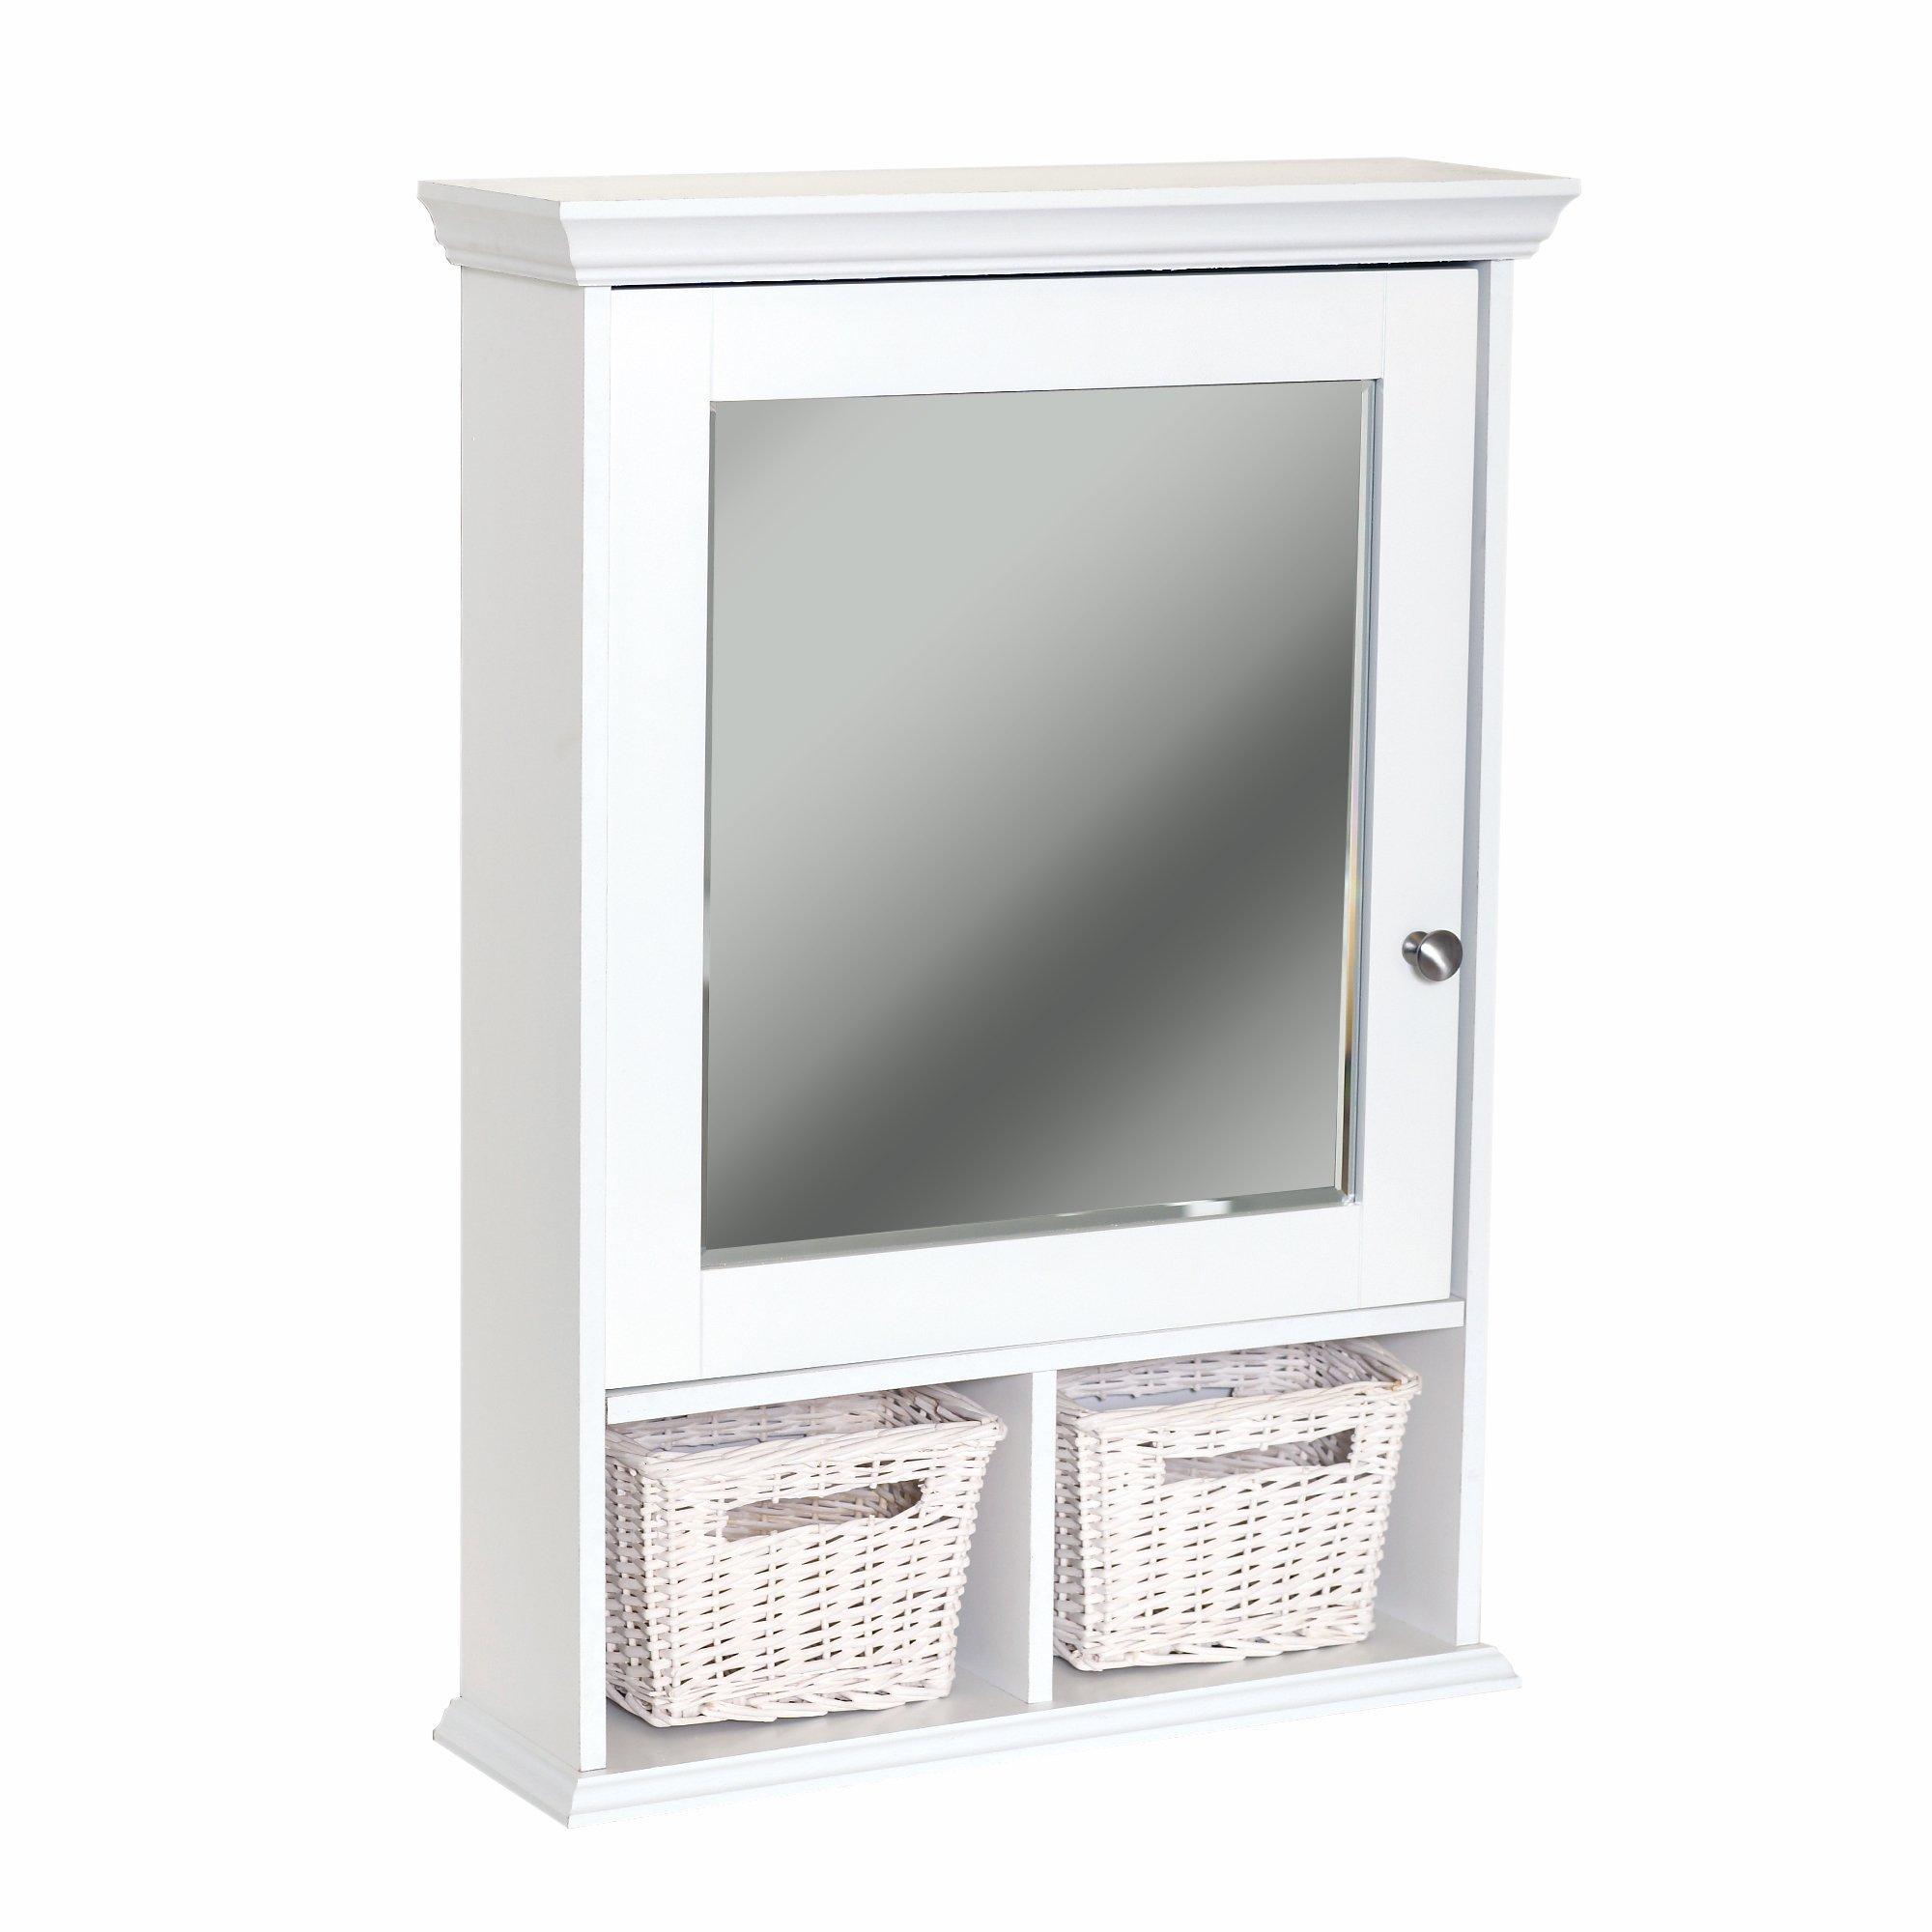 Zenith TH22WWBB, Medicine Cabinet with Wicker Baskets, White